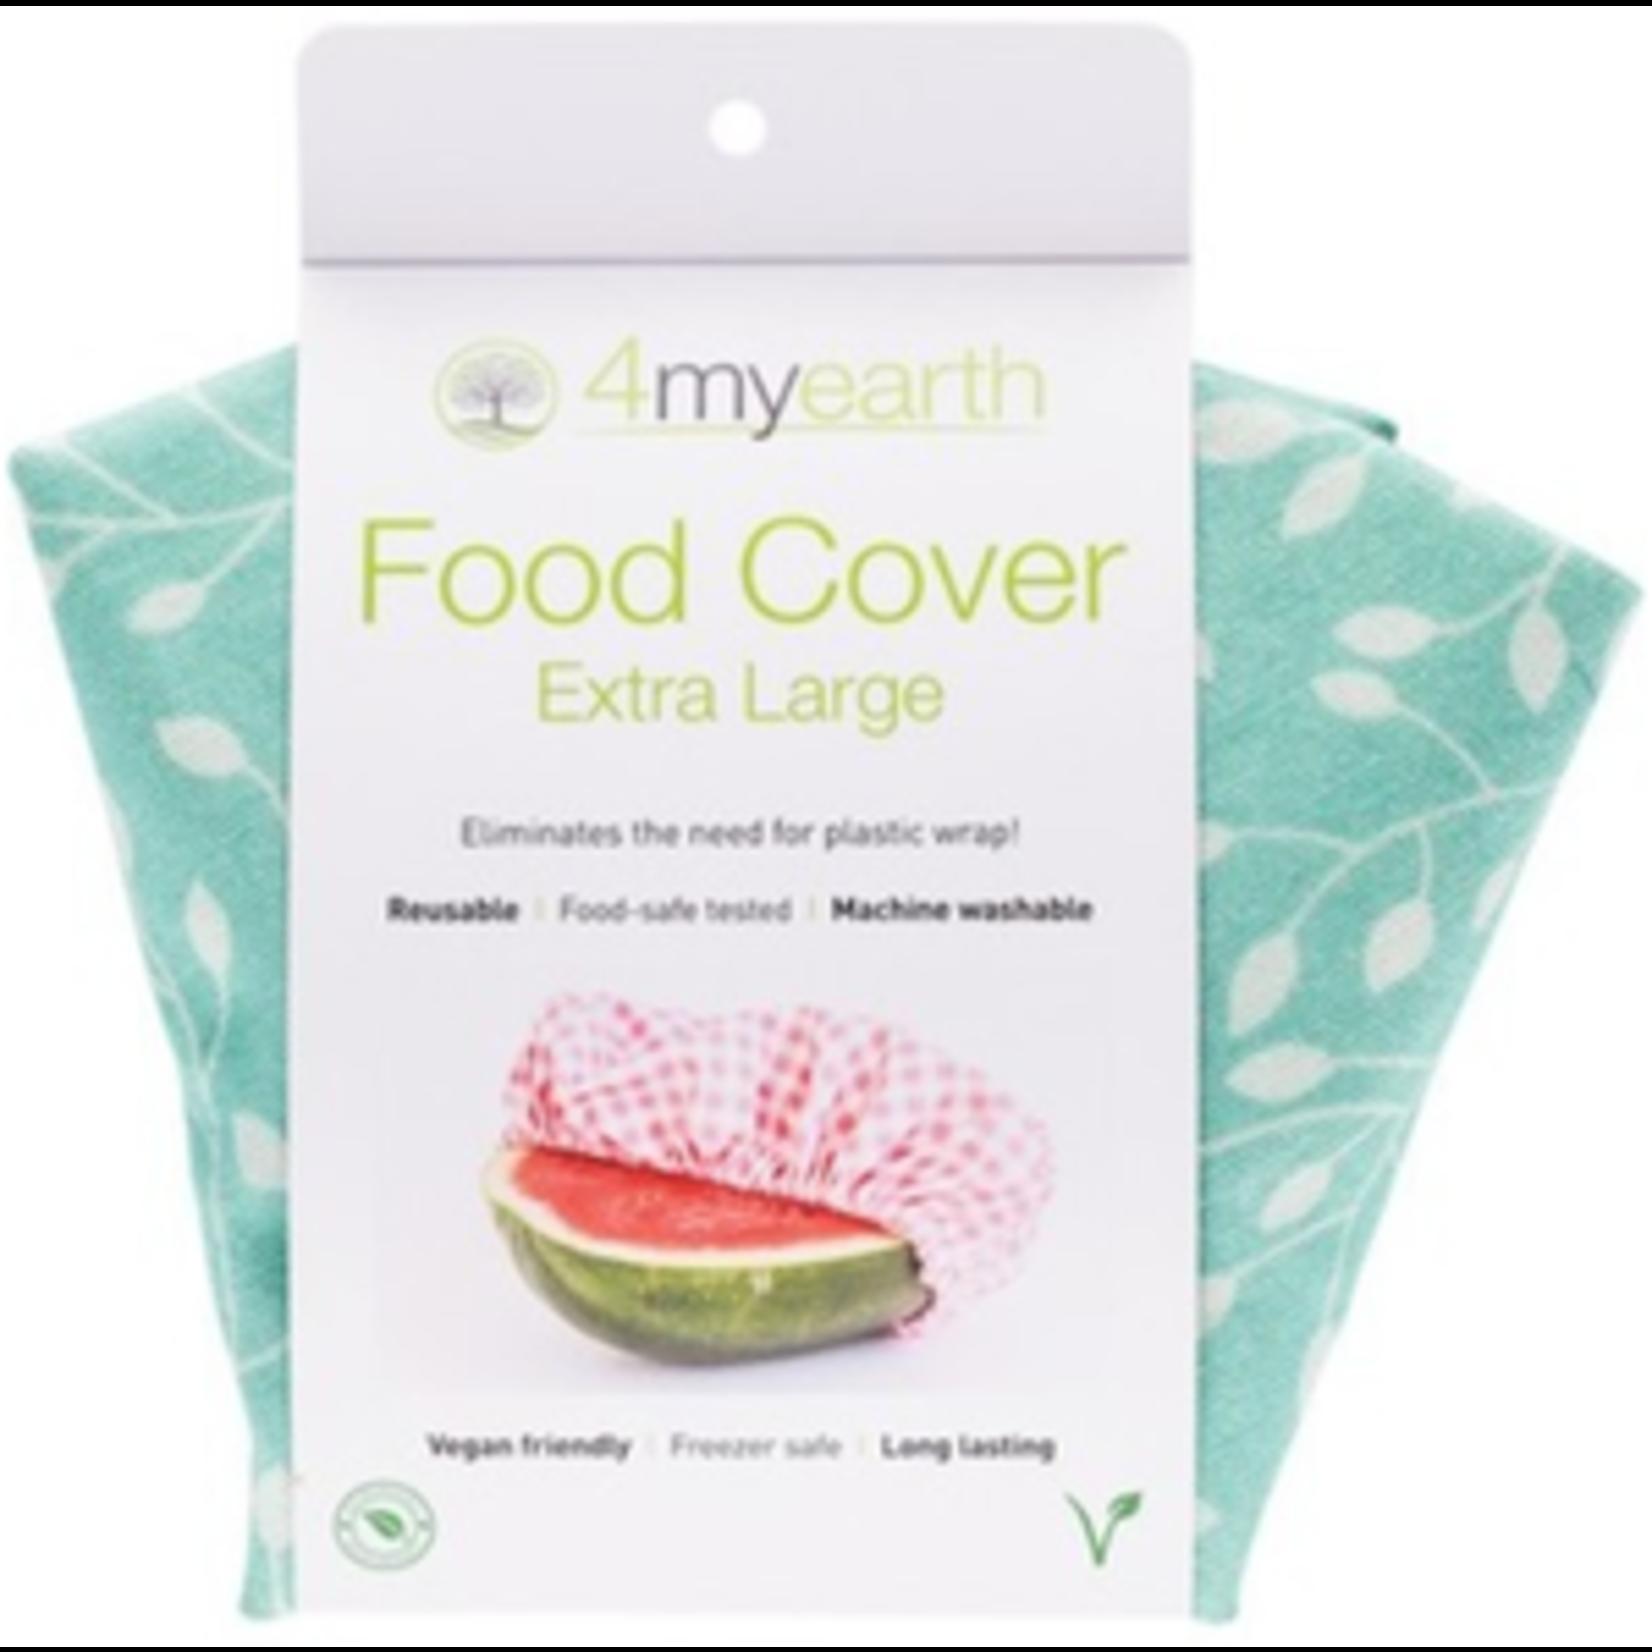 4 My Earth 4 My Earth Food Cover XL